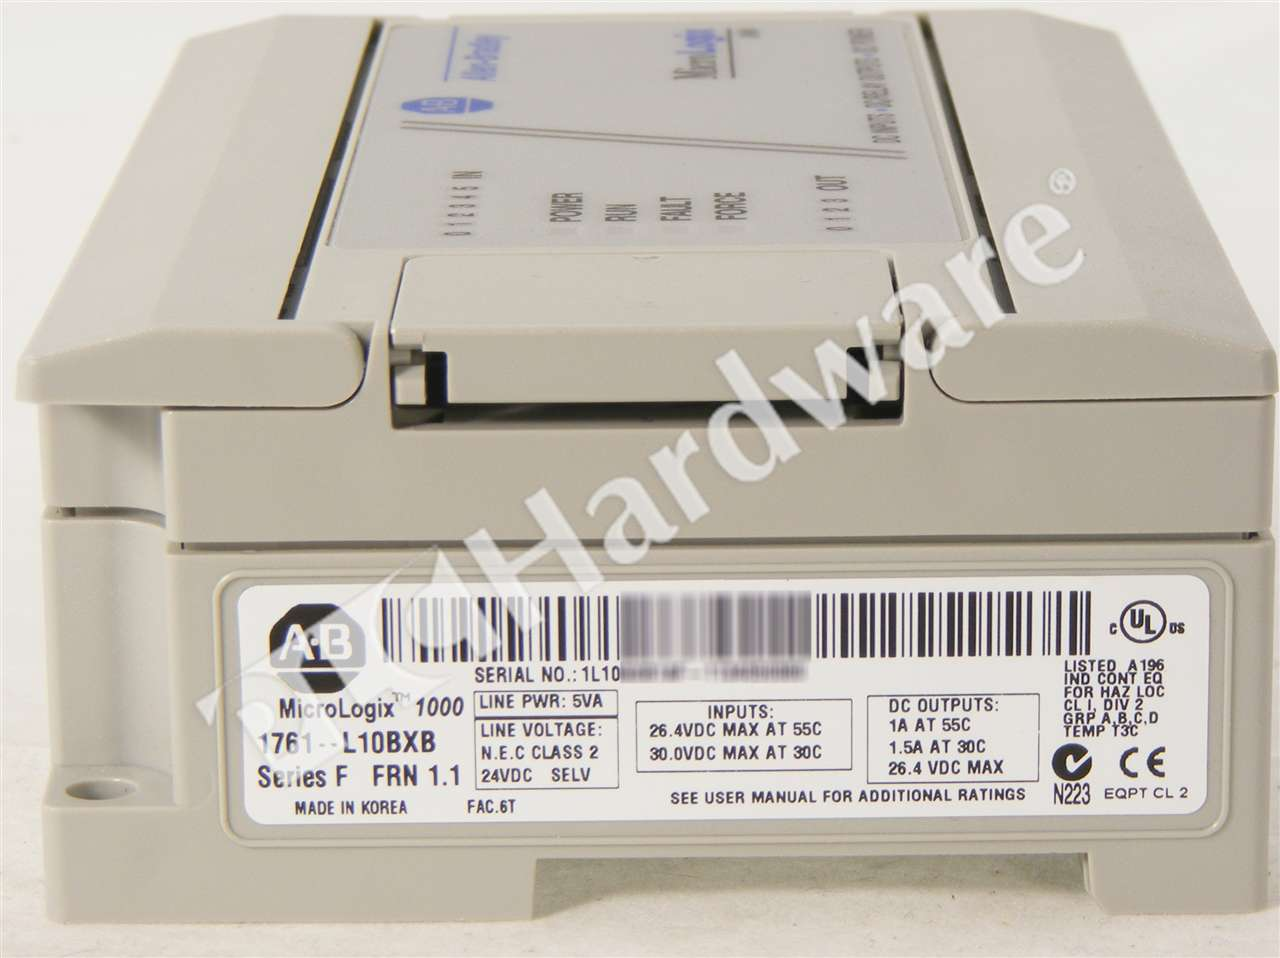 RA 1761 L10BXB F NSO_6_13_09_03_17_11_12_b micrologix 1000 analog dolgular com 1761-l10bxb wiring diagram at readyjetset.co